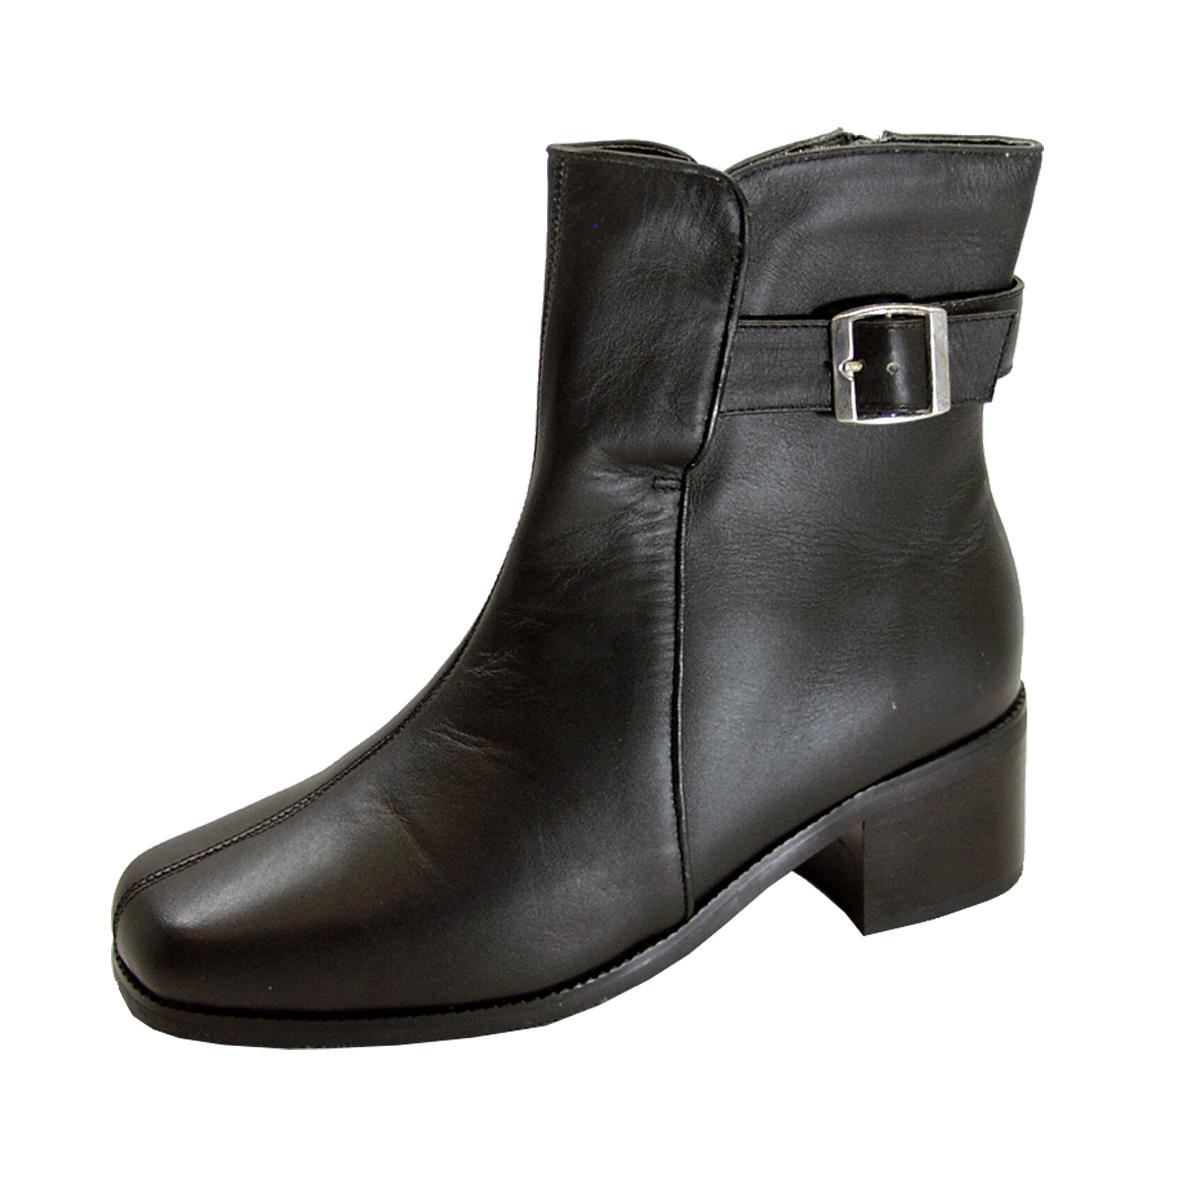 PEERAGE Meryl Women's Wide Width Leather Dress Bootie with Zipper - $44.95